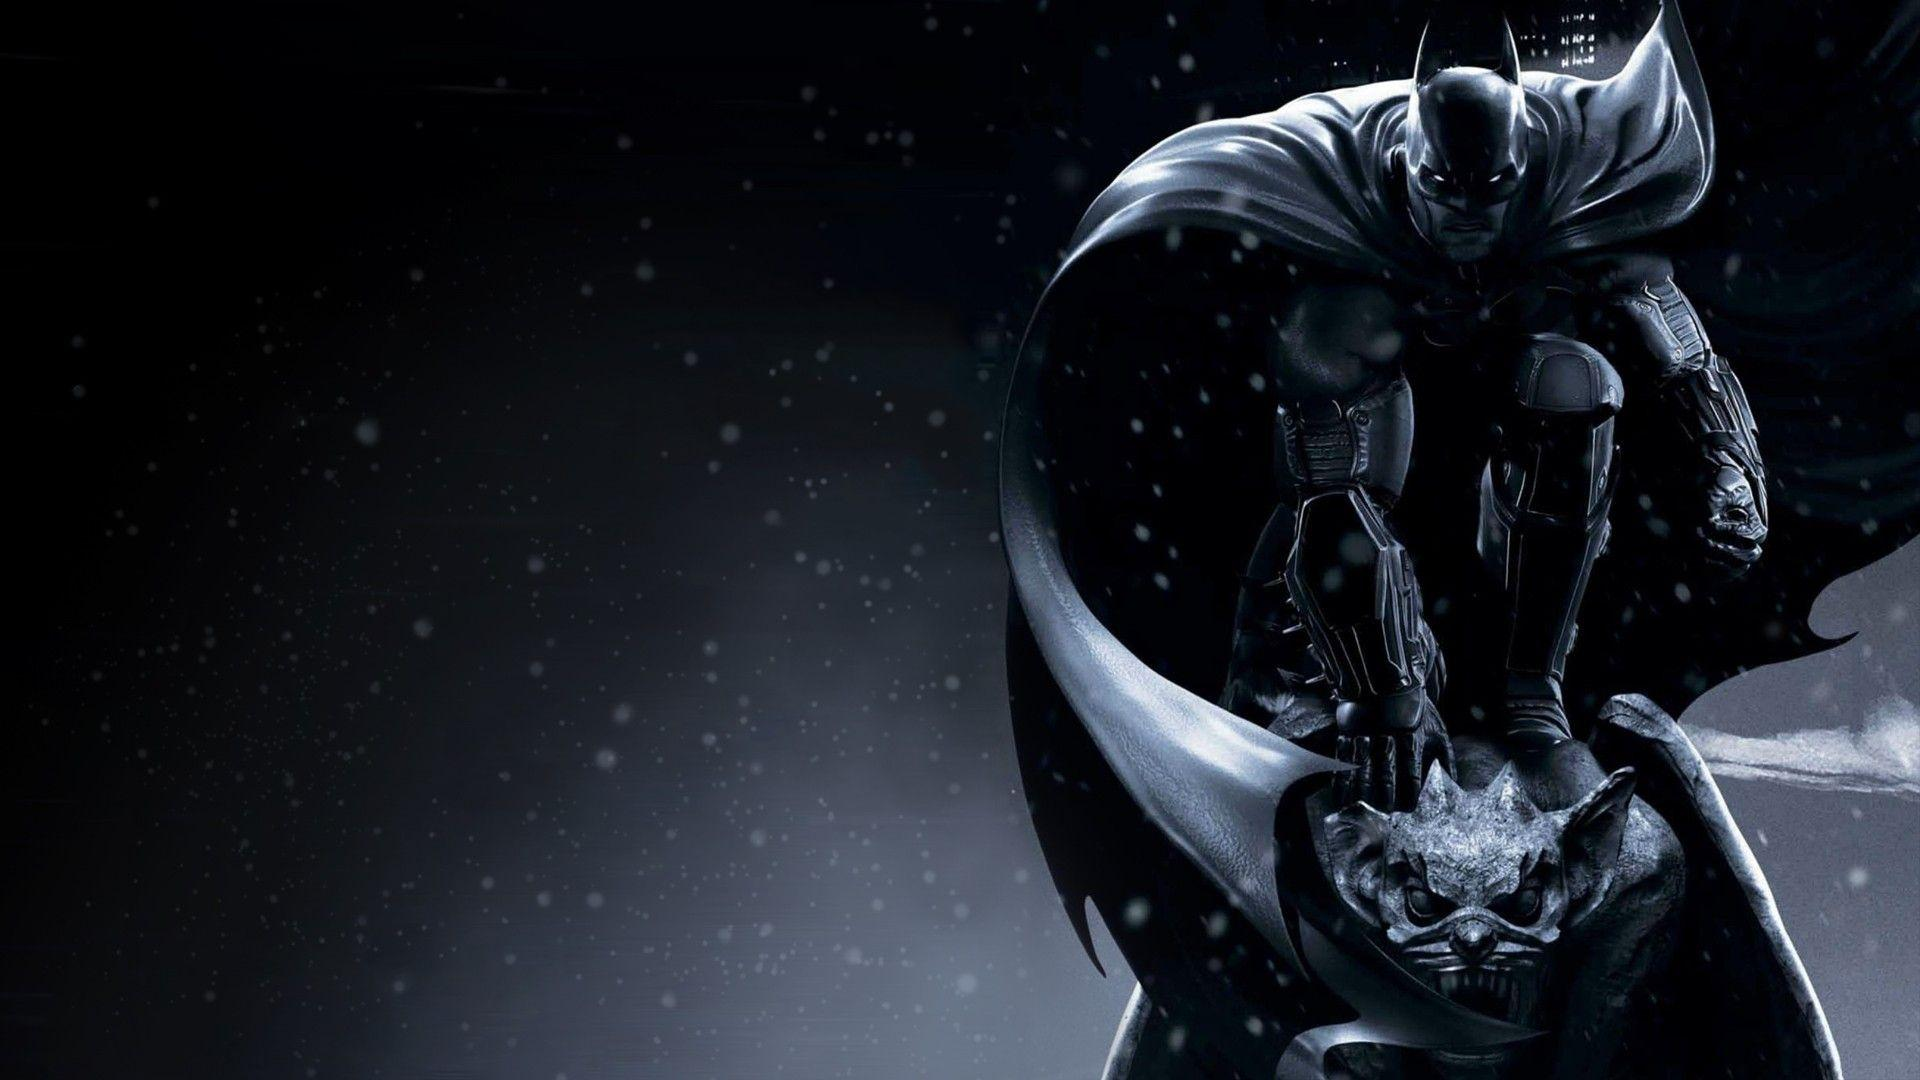 Batman Arkham Origins Joker Hd Wallpapers Wallpaper Cave